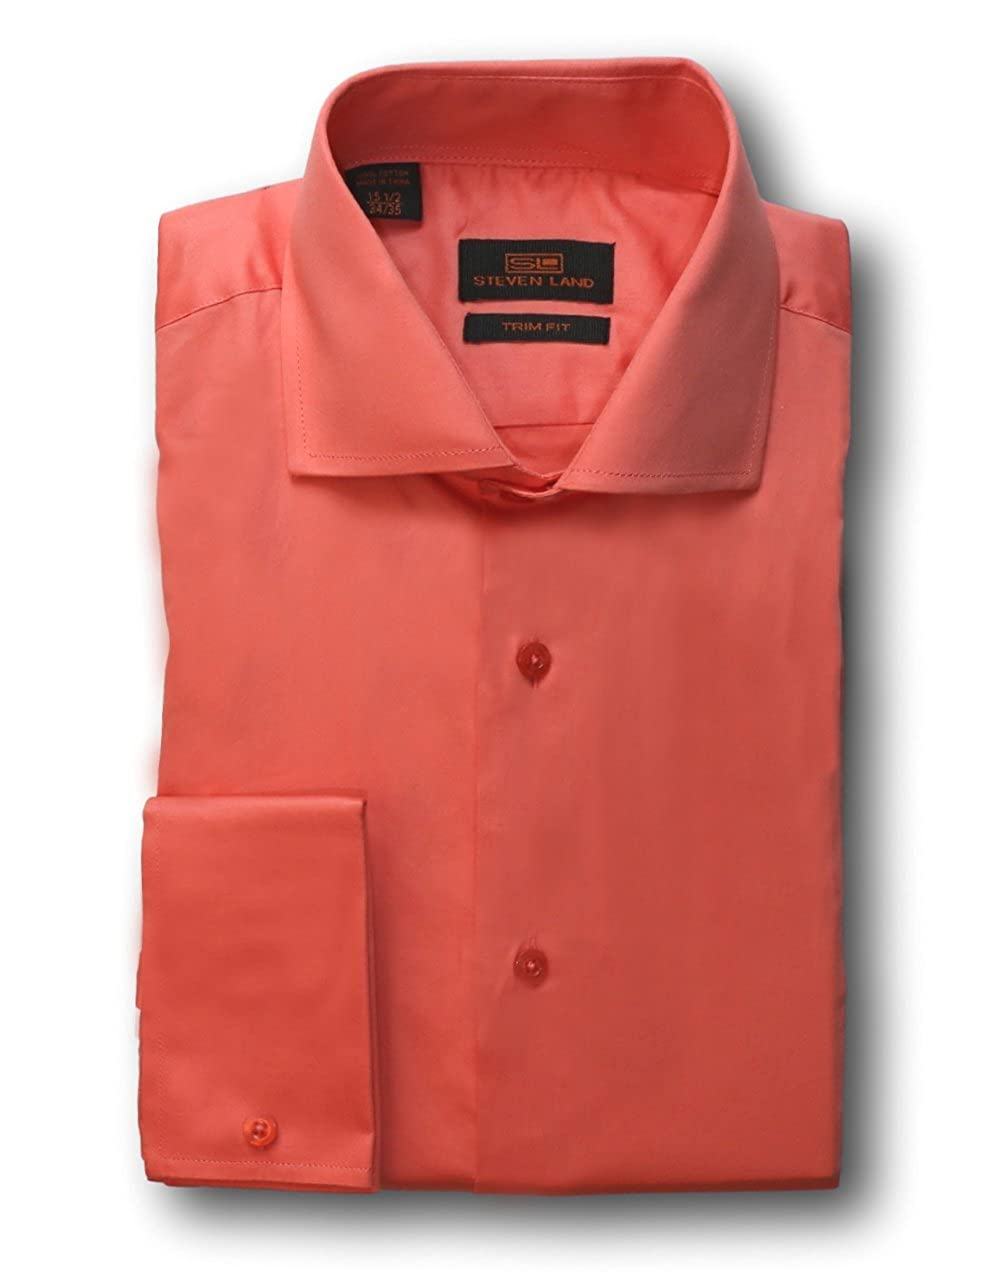 Steven Land Solid Sateen Dress Shirt 100 Cotton Ta214 Salmon Style